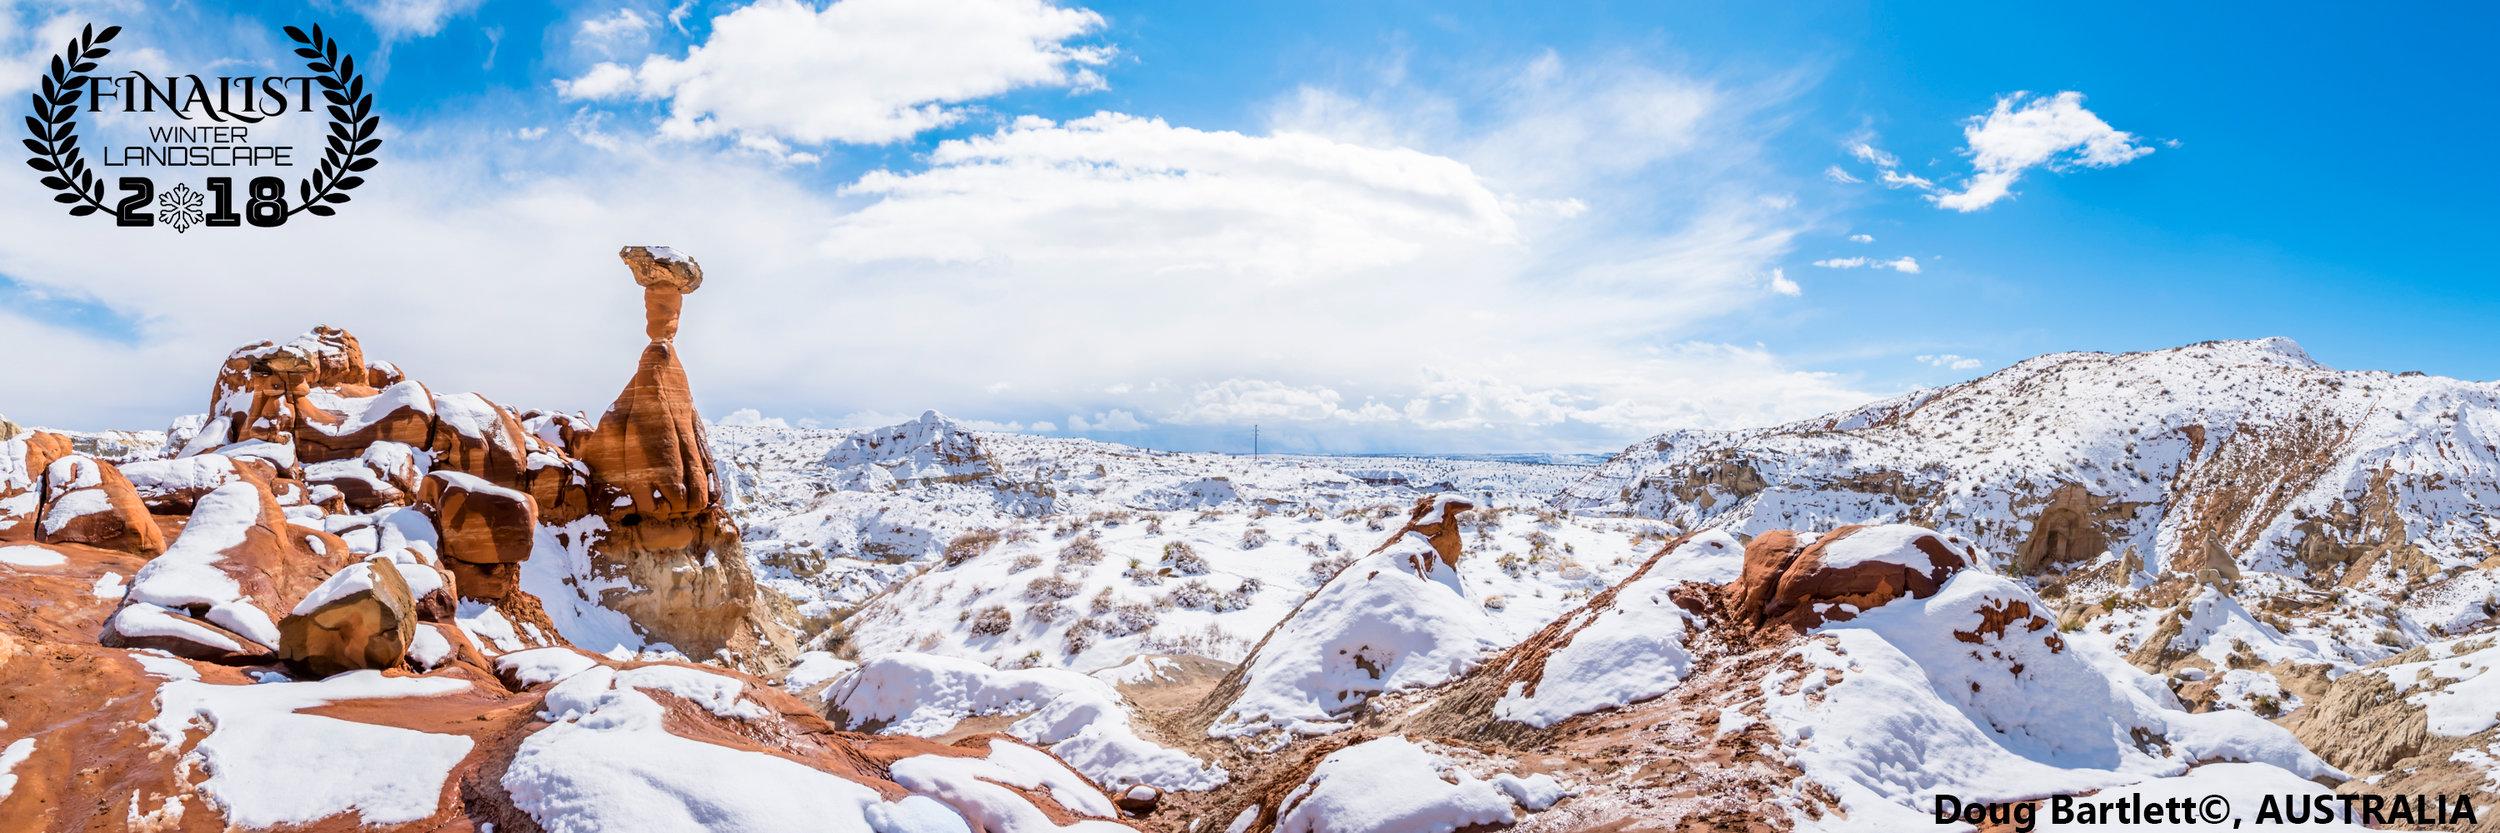 'Winter Toadstool Hoodoos'   Photographer: Doug Bartlett, AUSTRALIA